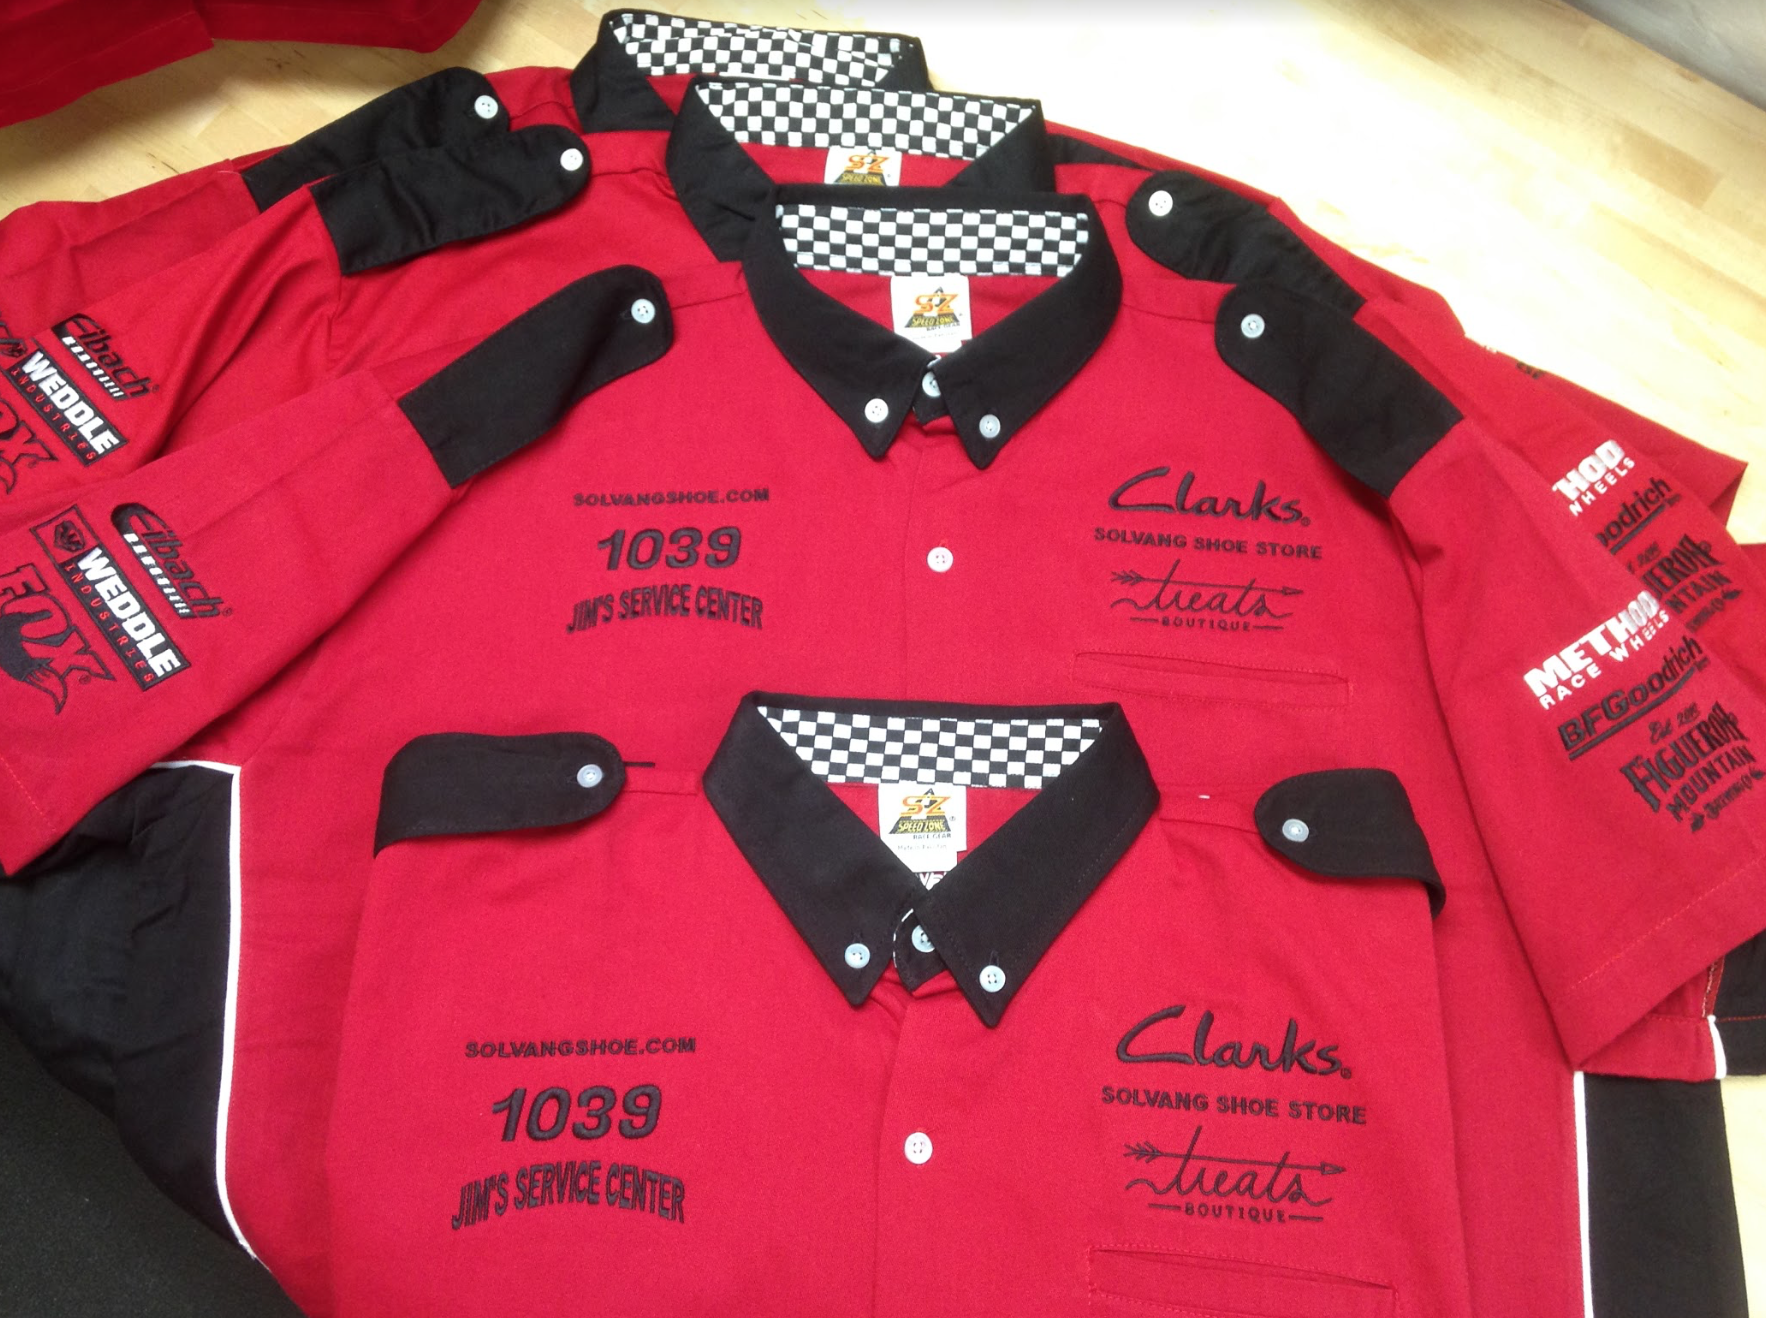 Racing Team Shirts